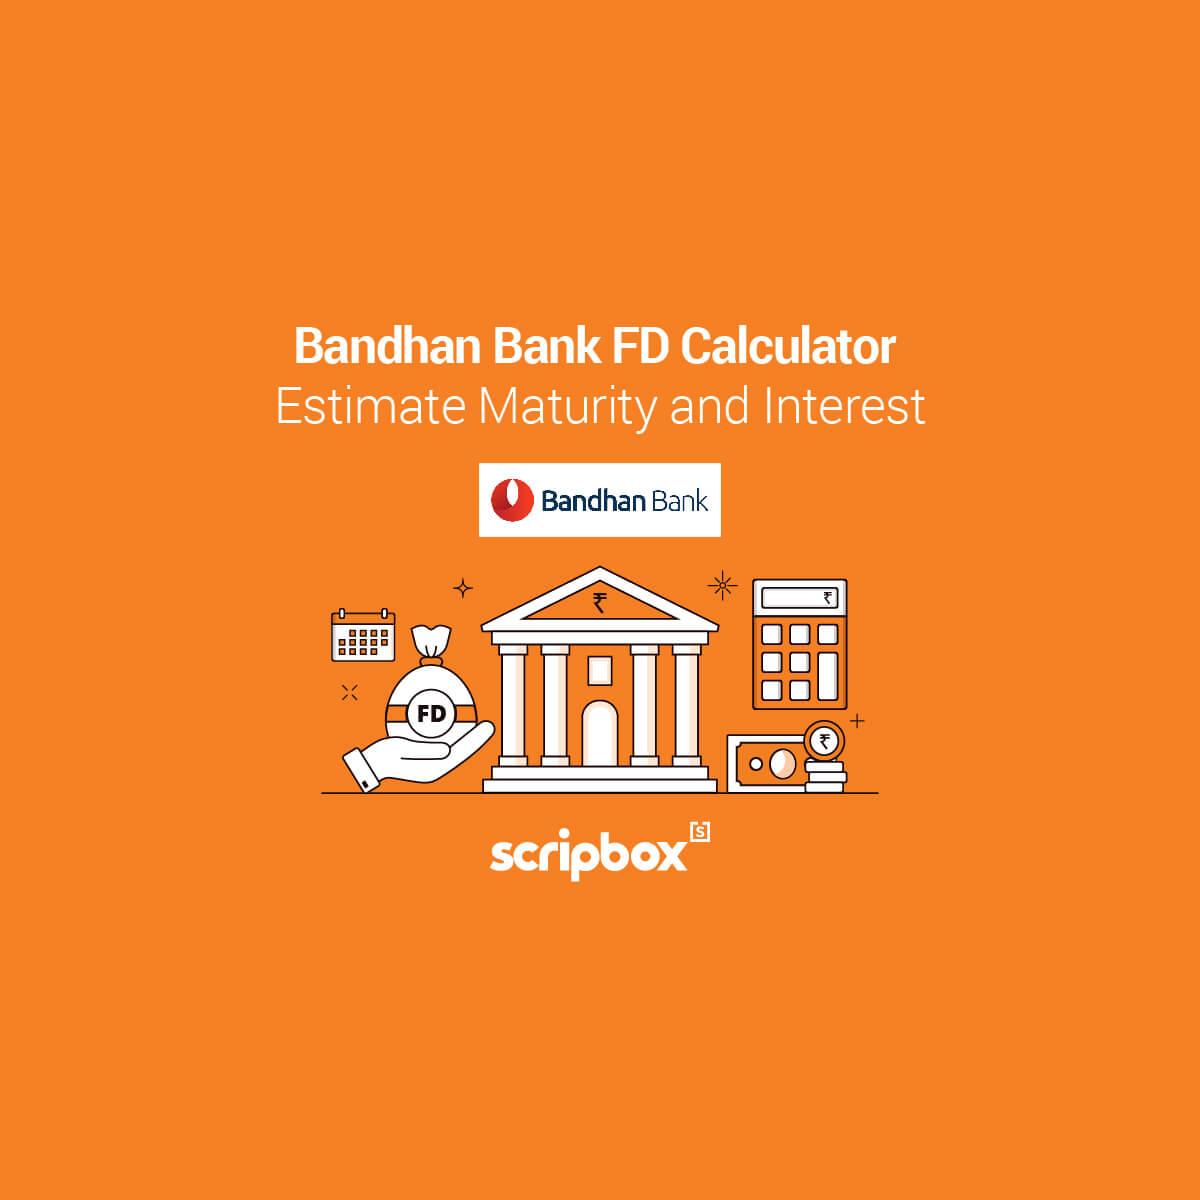 bandhan bank fd calculator